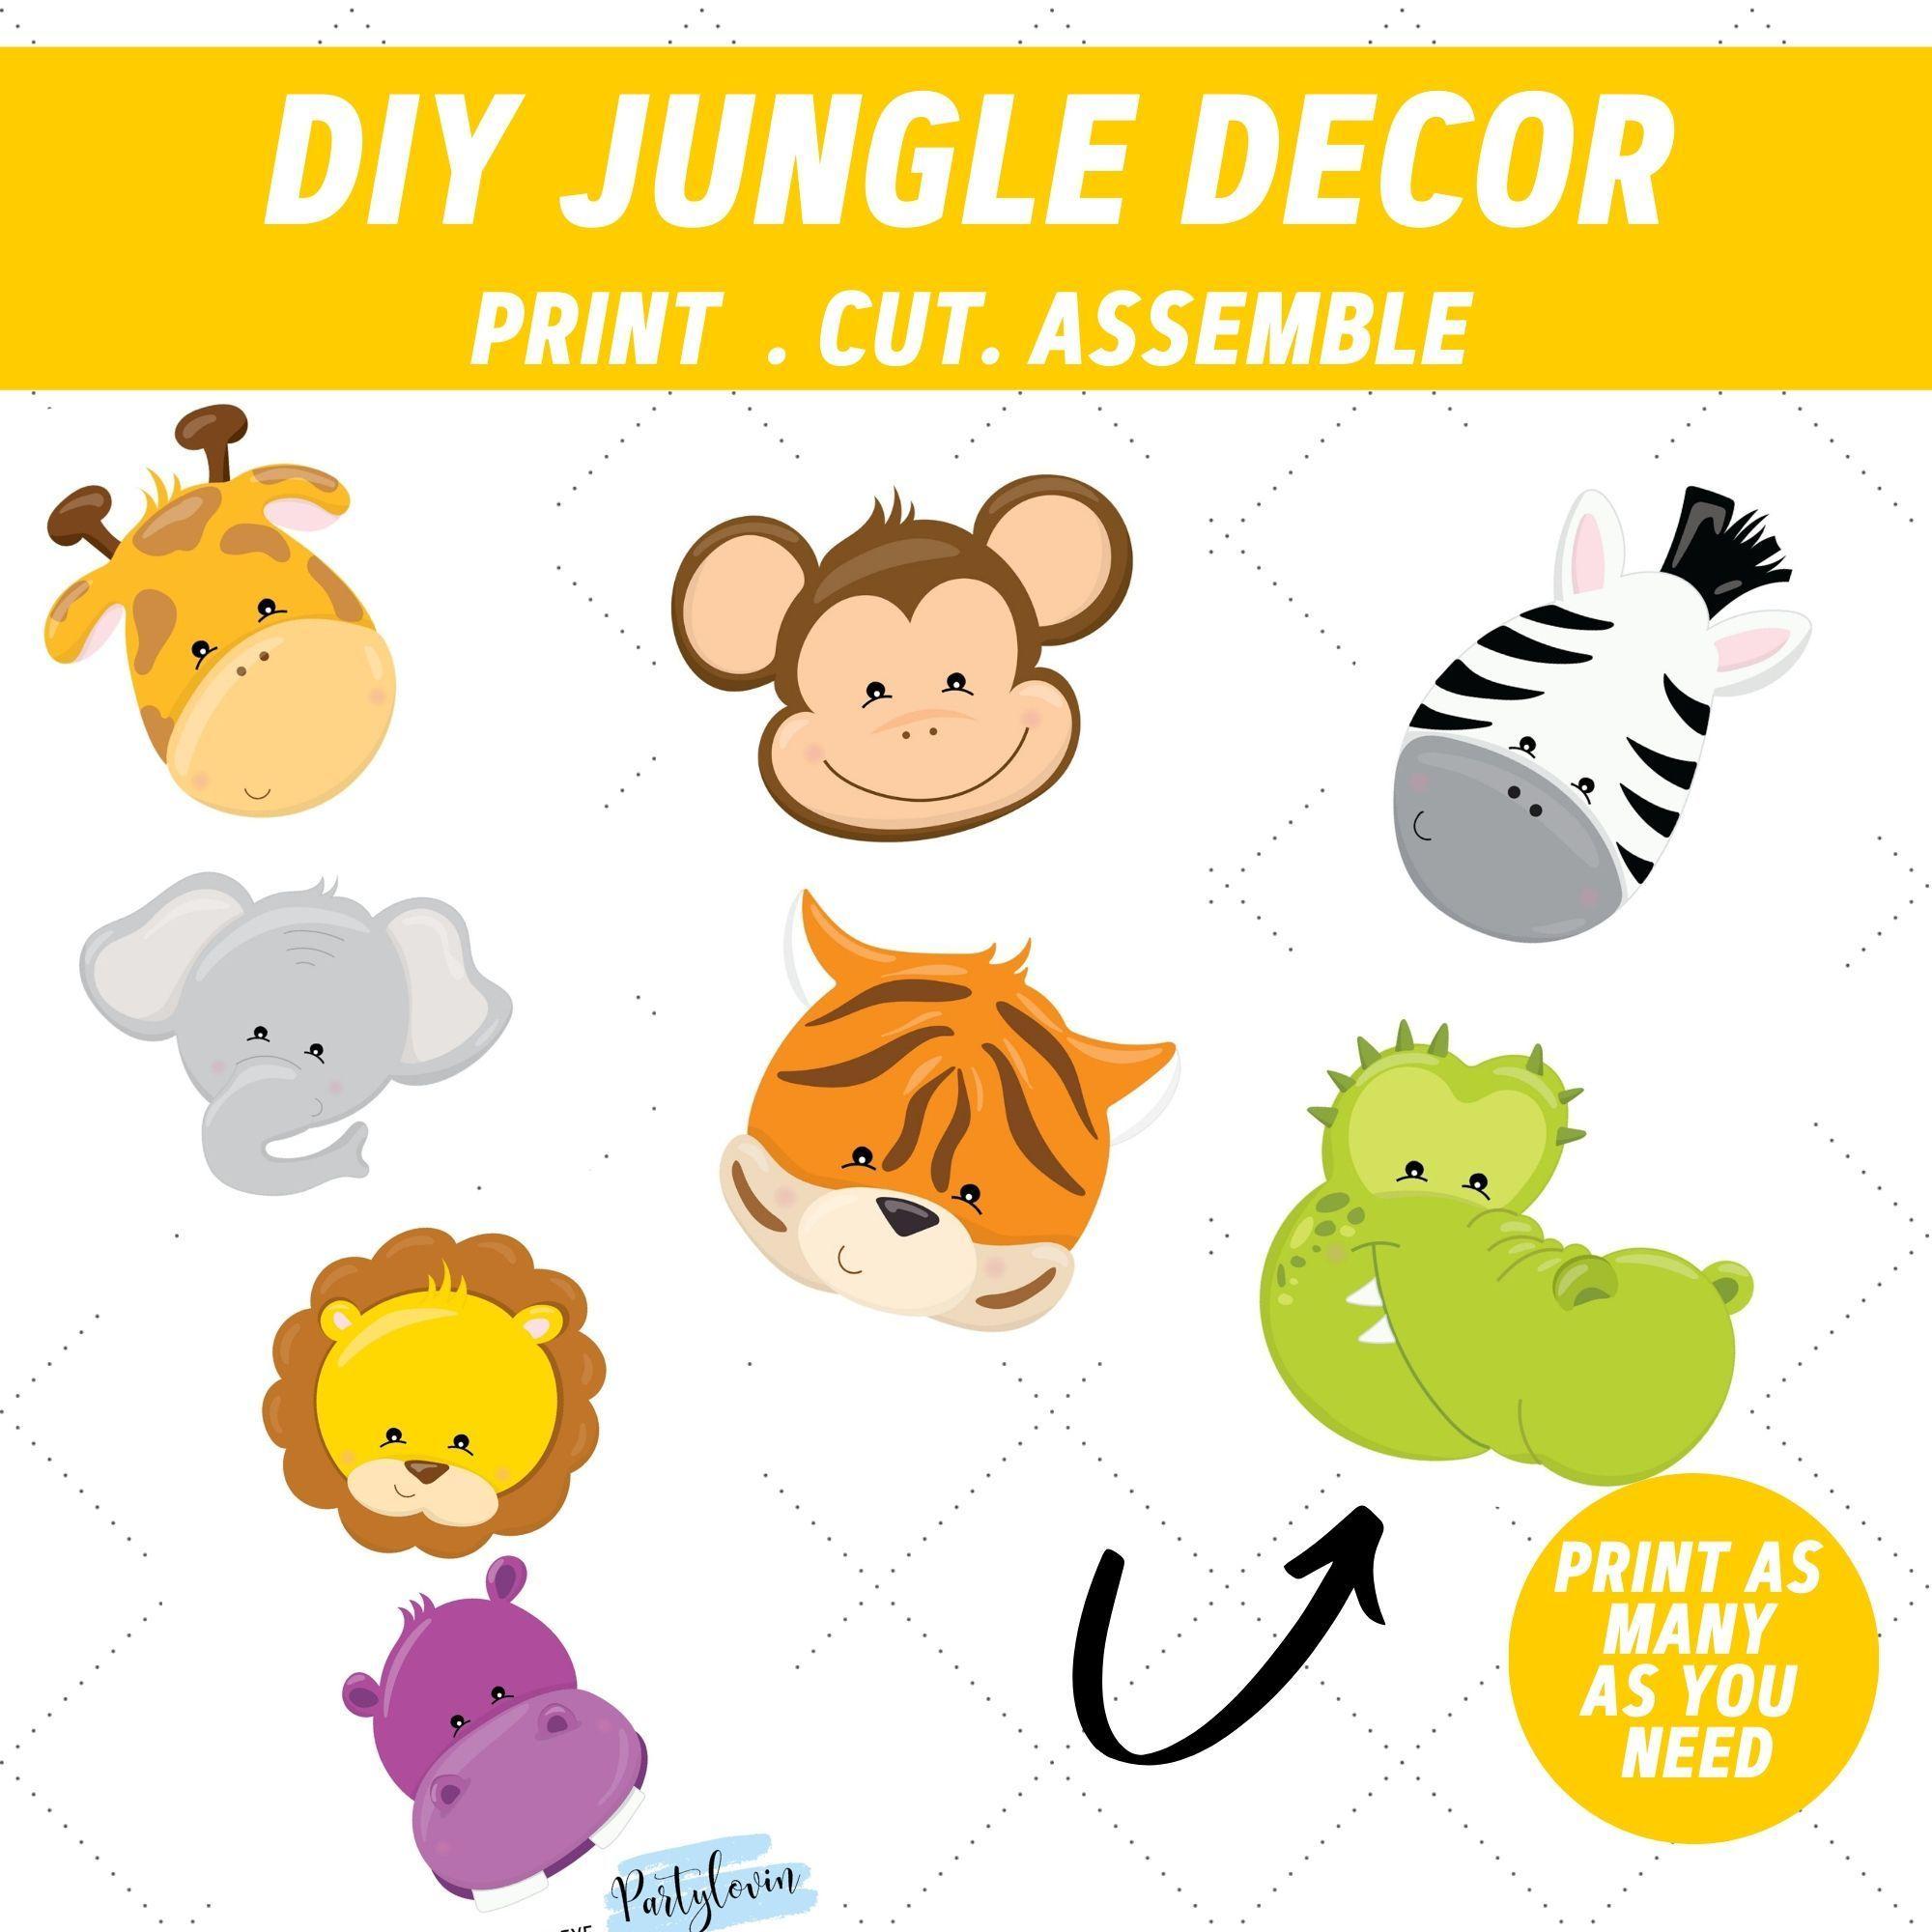 Jungle Safari Printable Free Invitation Jungle Safari Party Jungle Safari Birthday Safari Party